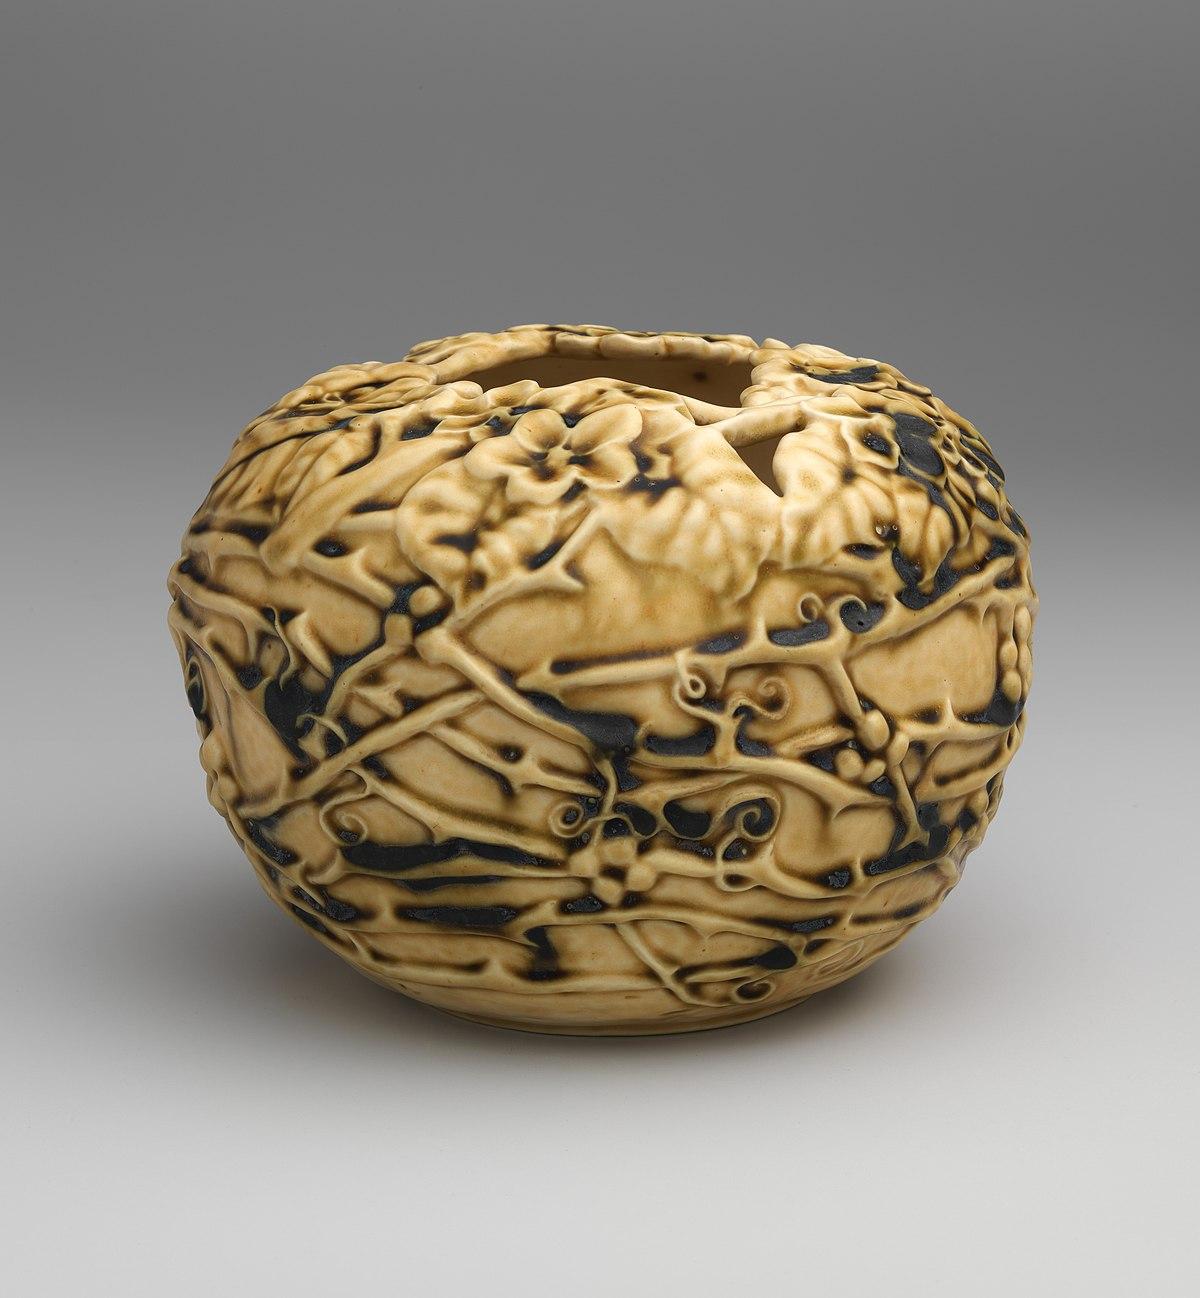 https://commons.wikimedia.org/wiki/File:Bowl_with_flowering_vine_MET_DP704317.jpg